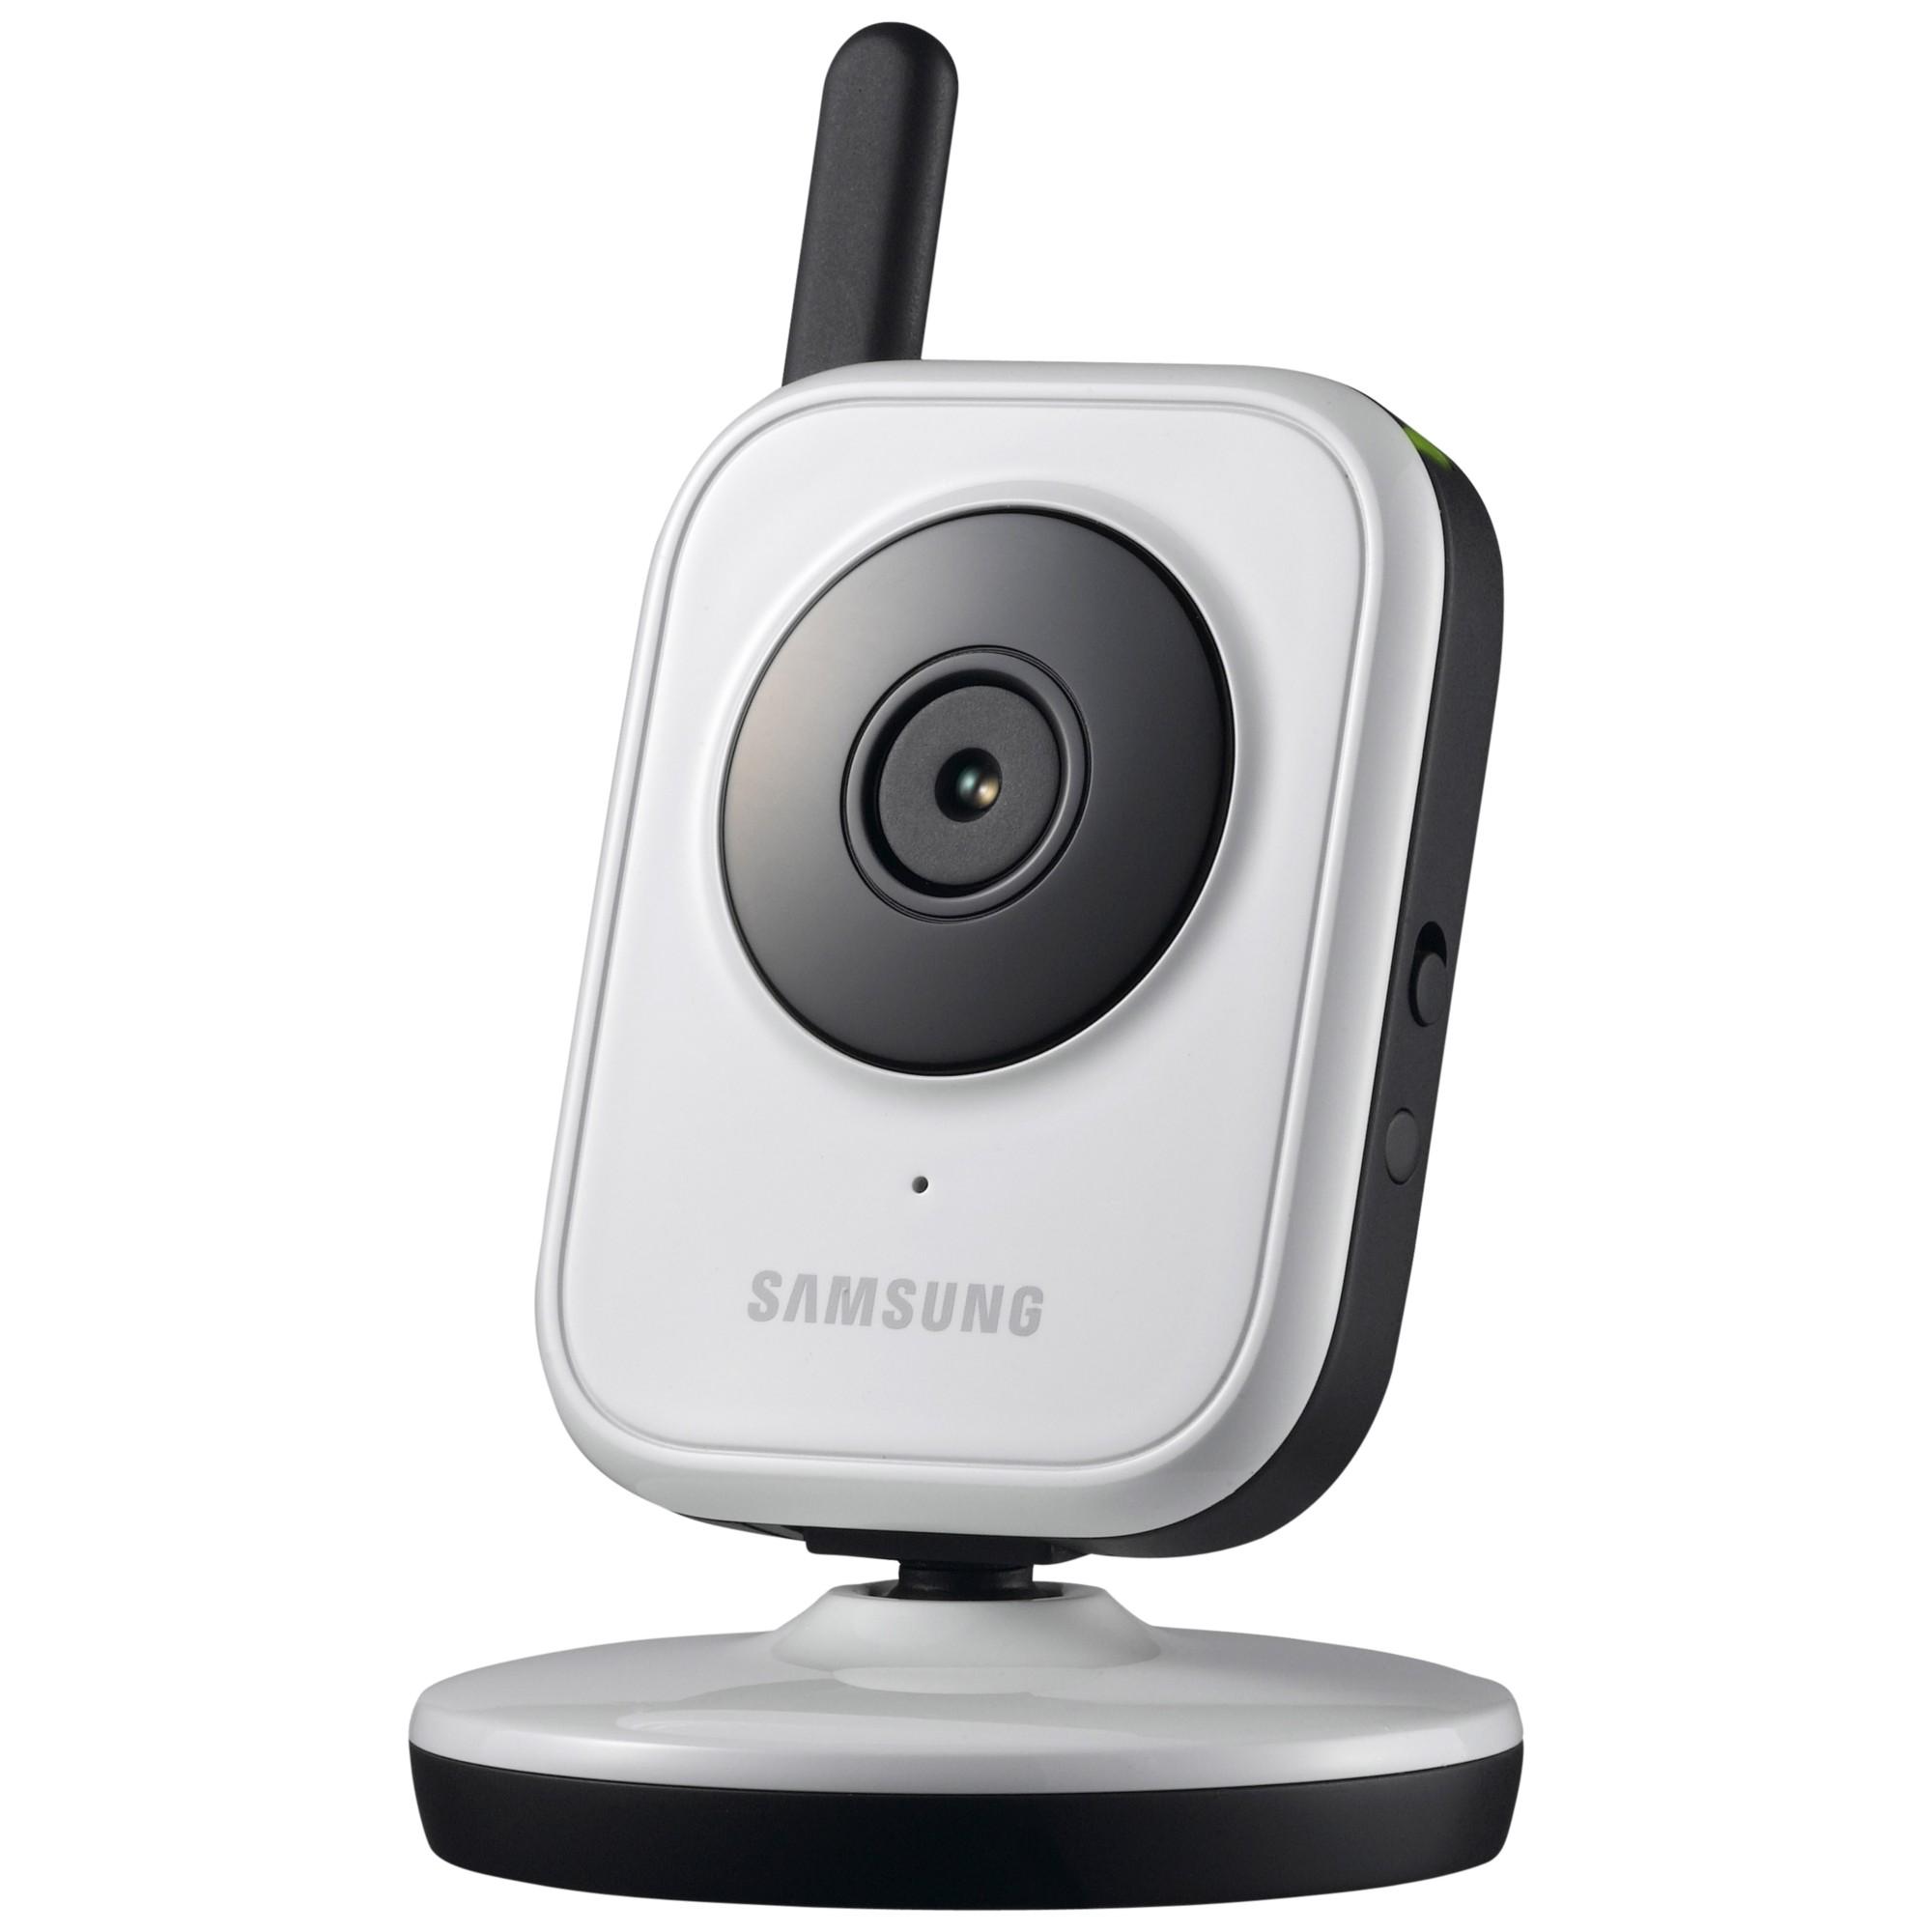 Samsung SEB-1019RW Add-On Night Vision Baby Monitor Camera